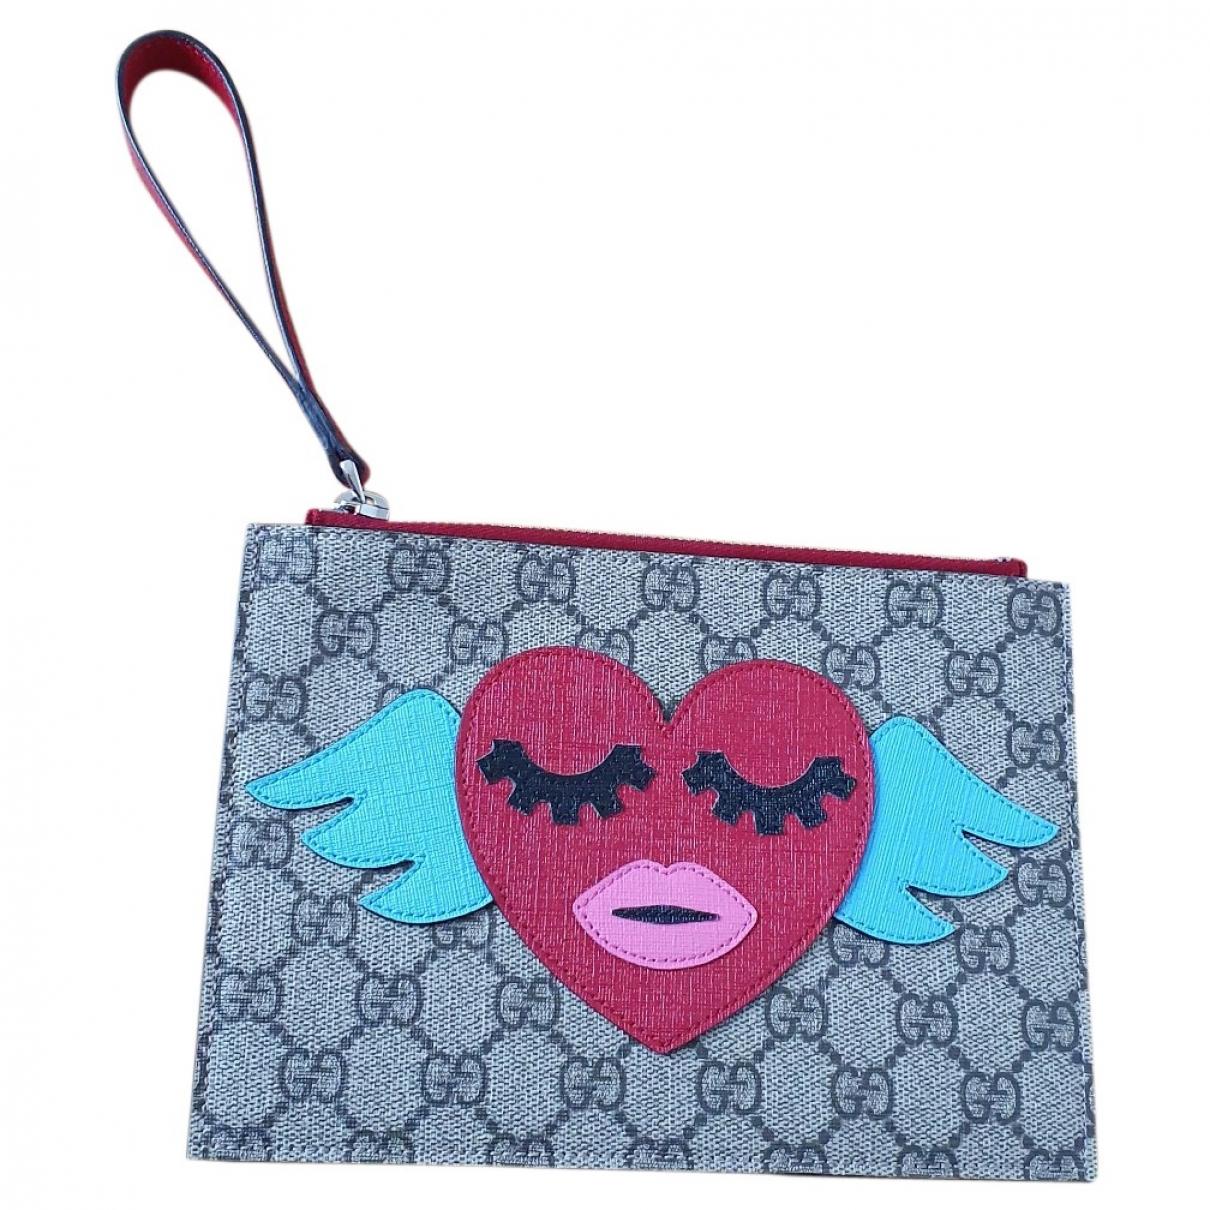 Gucci \N Beige bag & Pencil cases for Kids \N